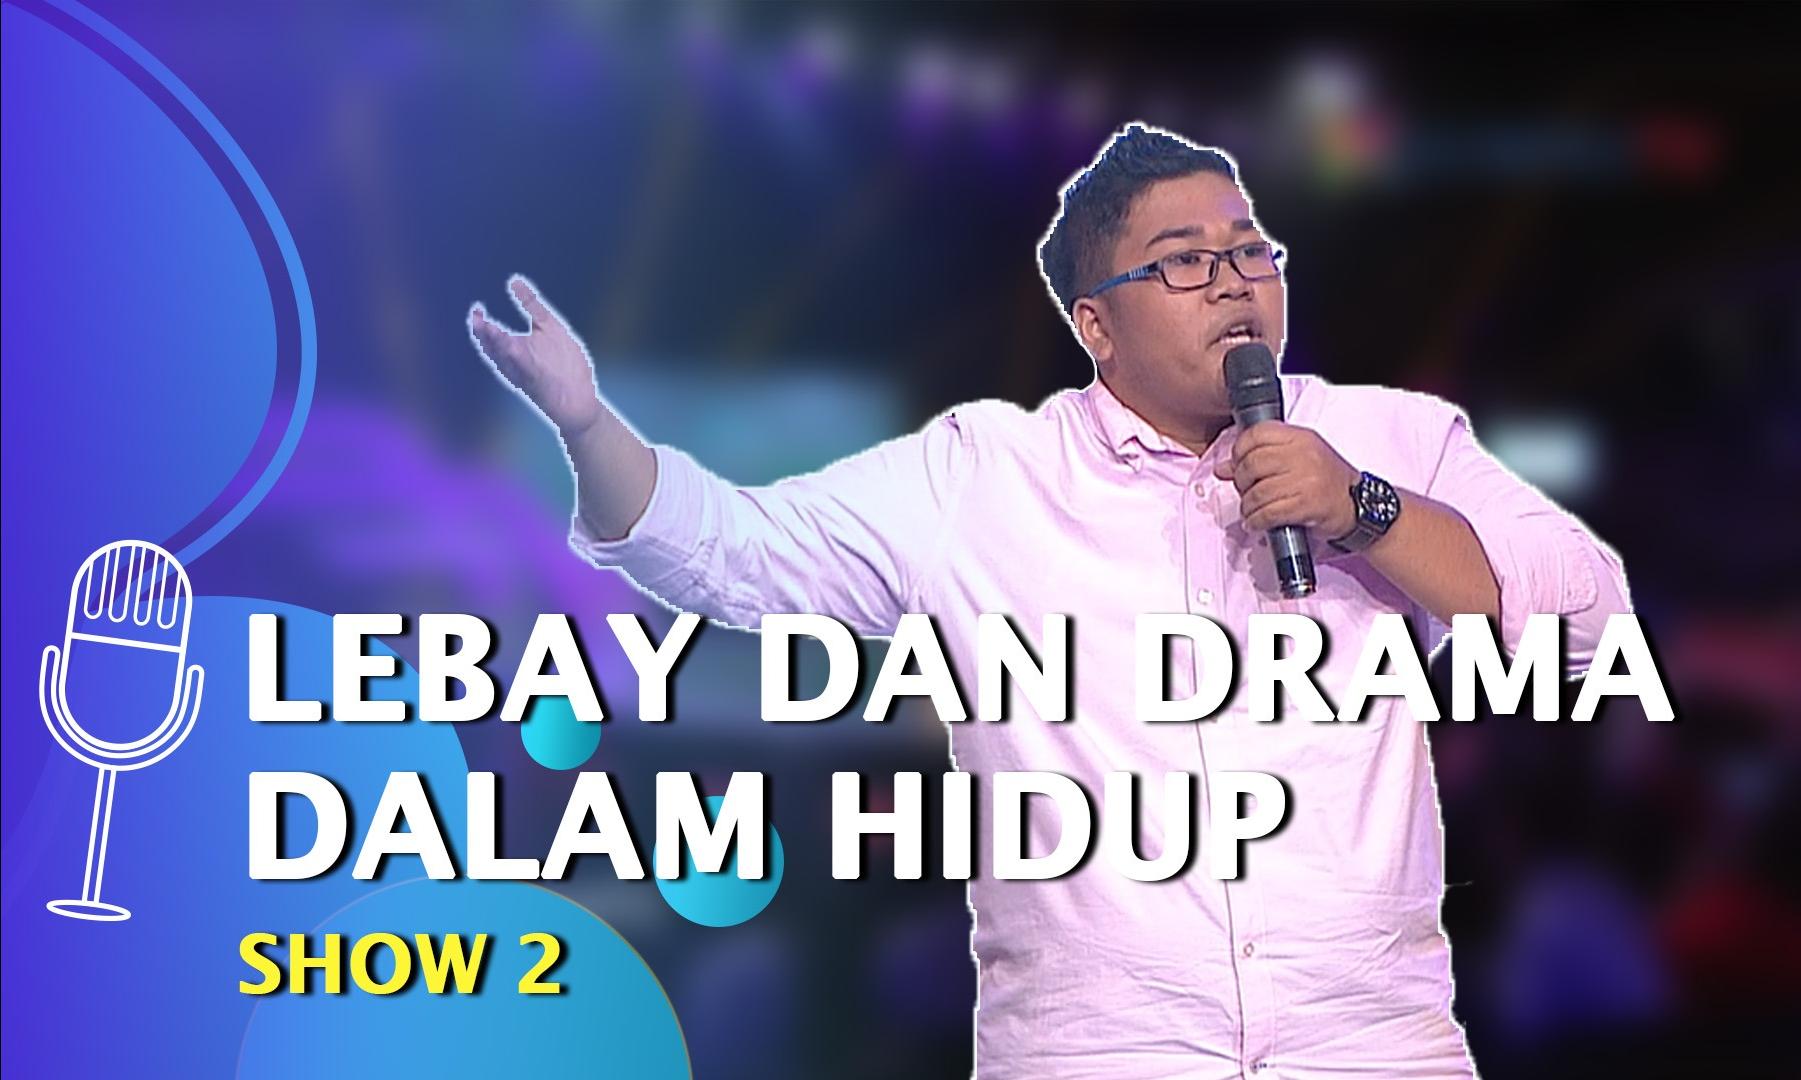 stand-up-comedy-ubay-acara-dangdut-cuma-ambil-sudut-lebay-dan-drama-hidup-suci-5